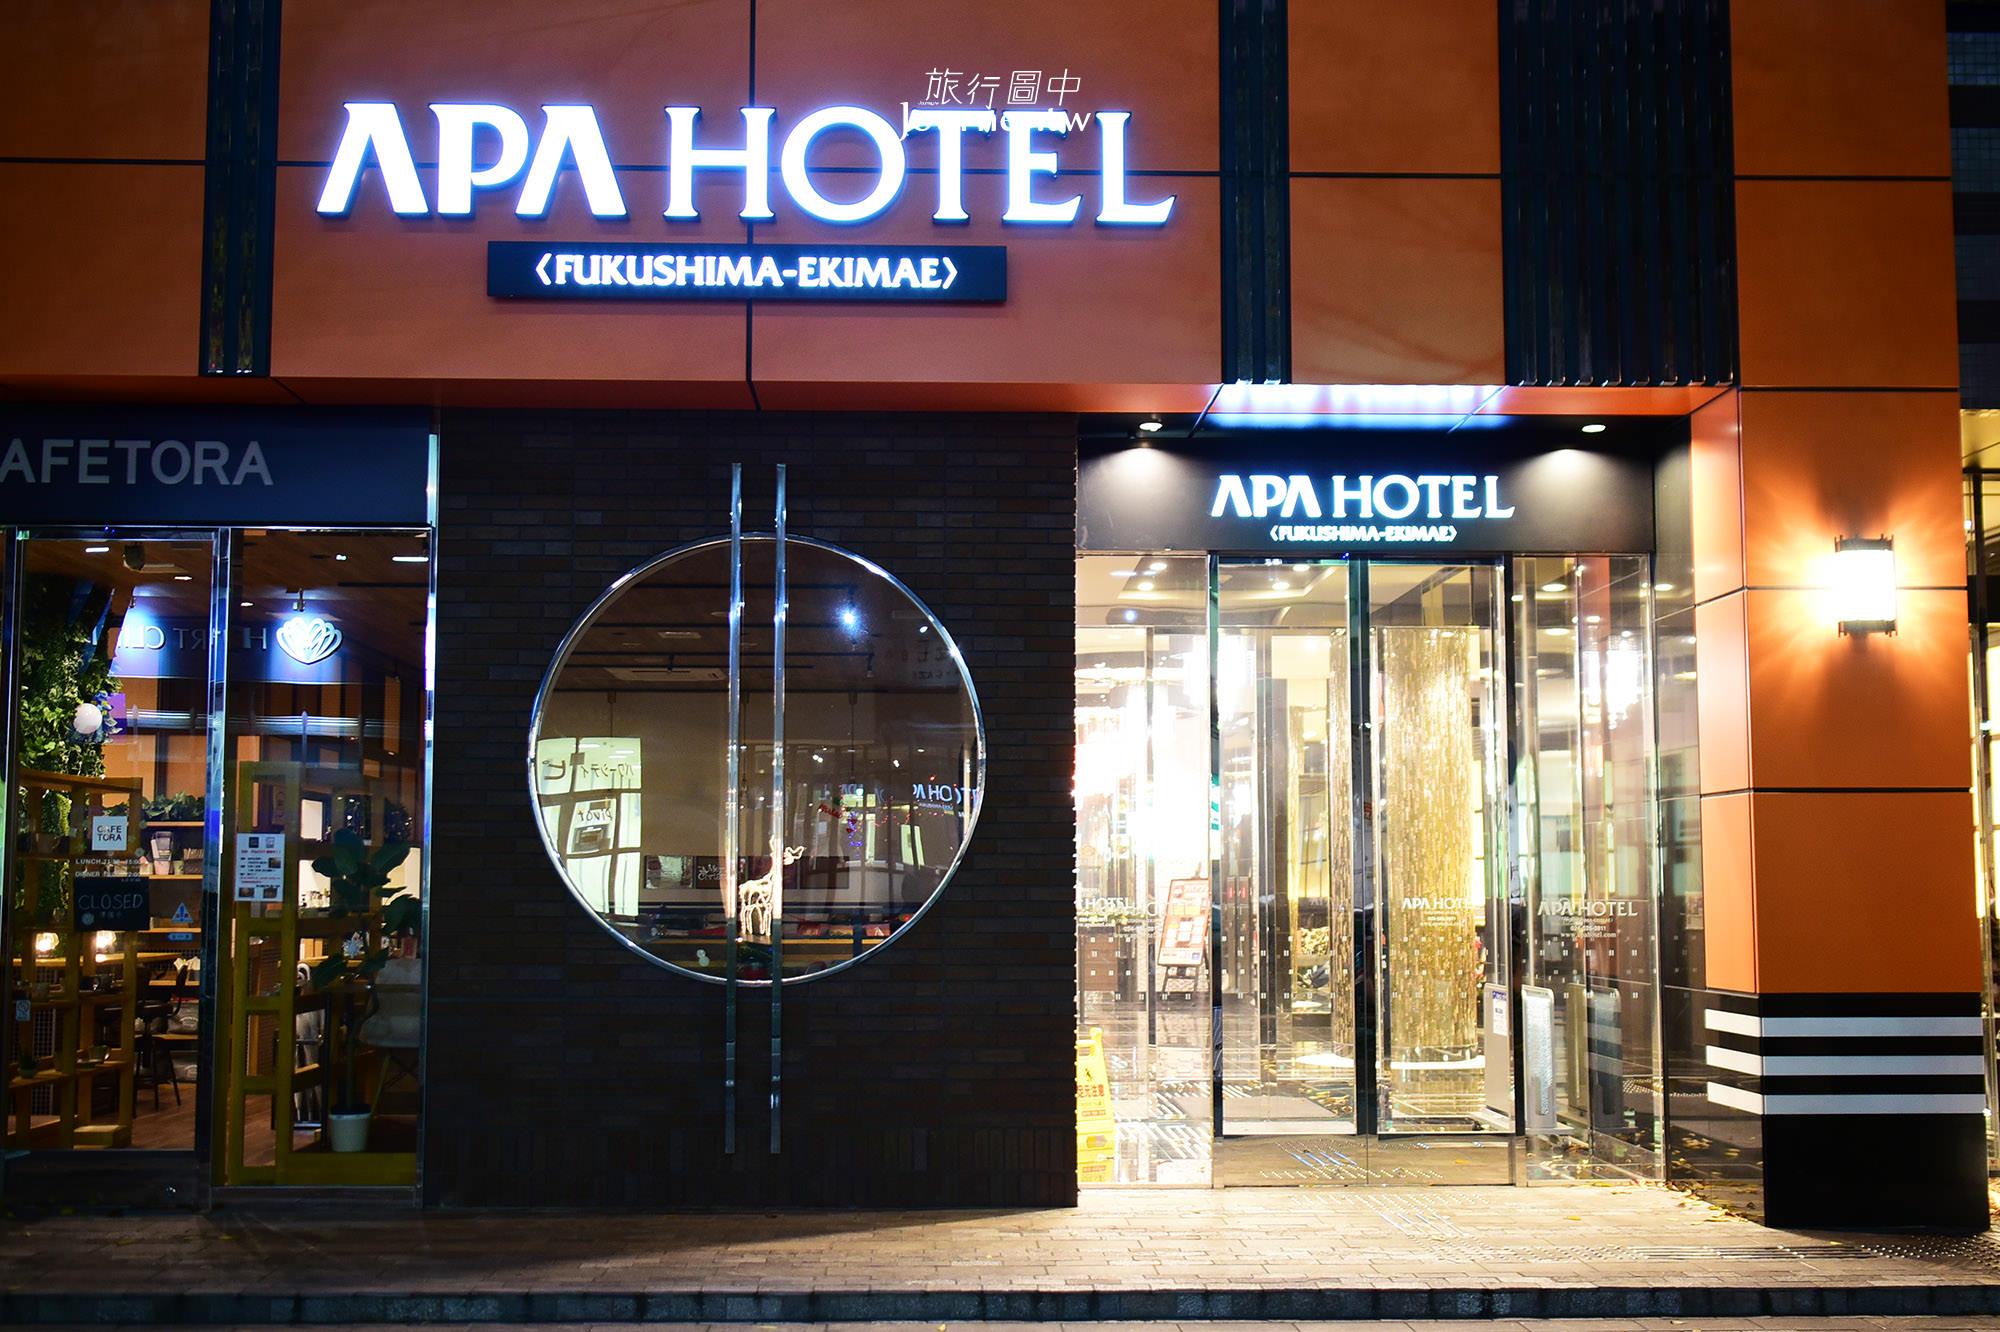 日本,東北,福島,福島住宿,APA 福島駅前,APA Hotel Fukushima